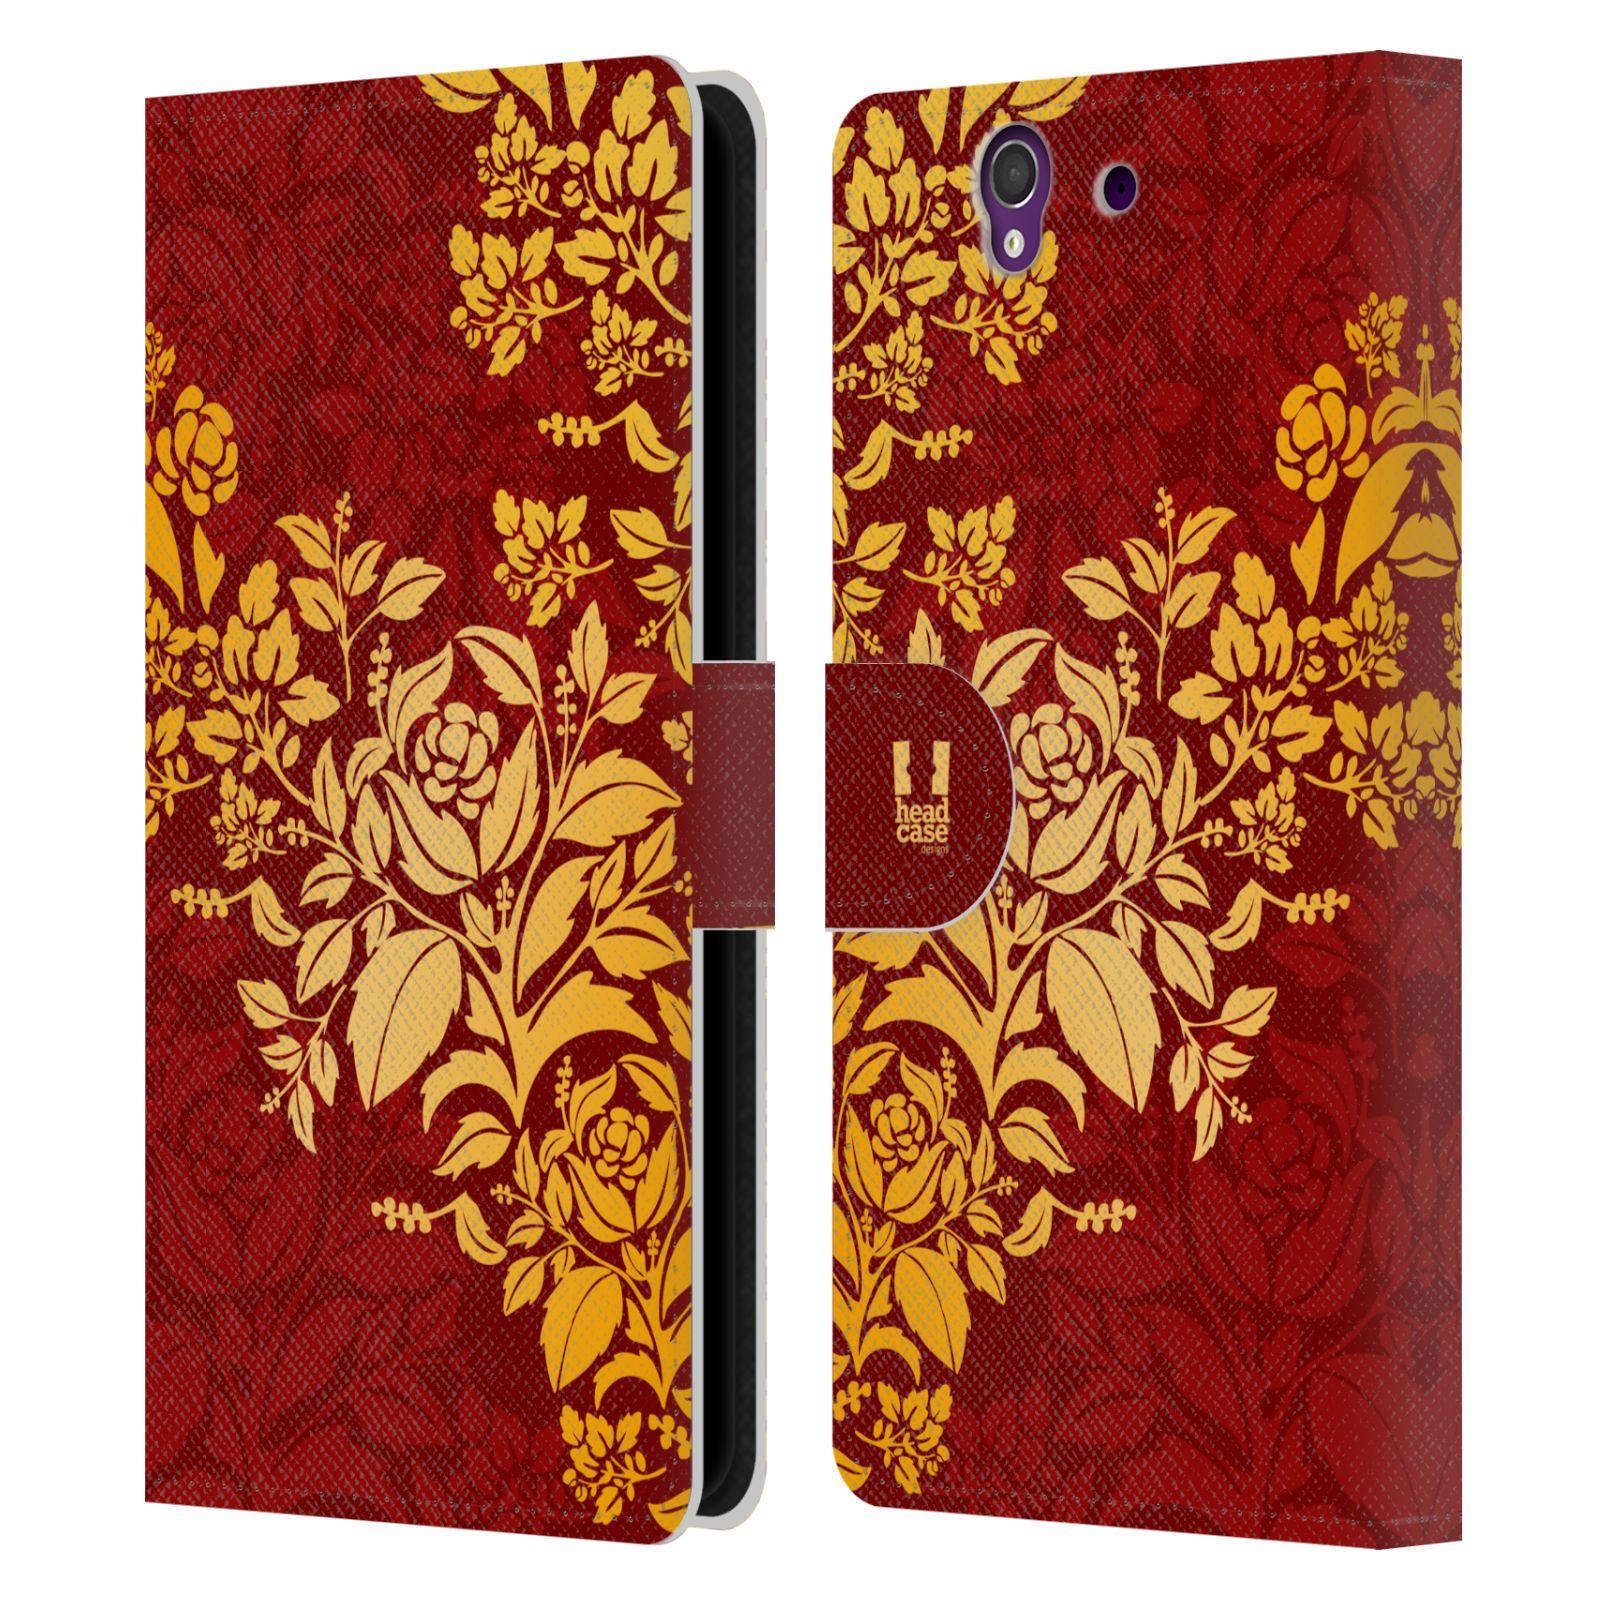 HEAD CASE Flipové pouzdro pro mobil SONY XPERIA Z (C6603) moderní baroko rudá a zlatá